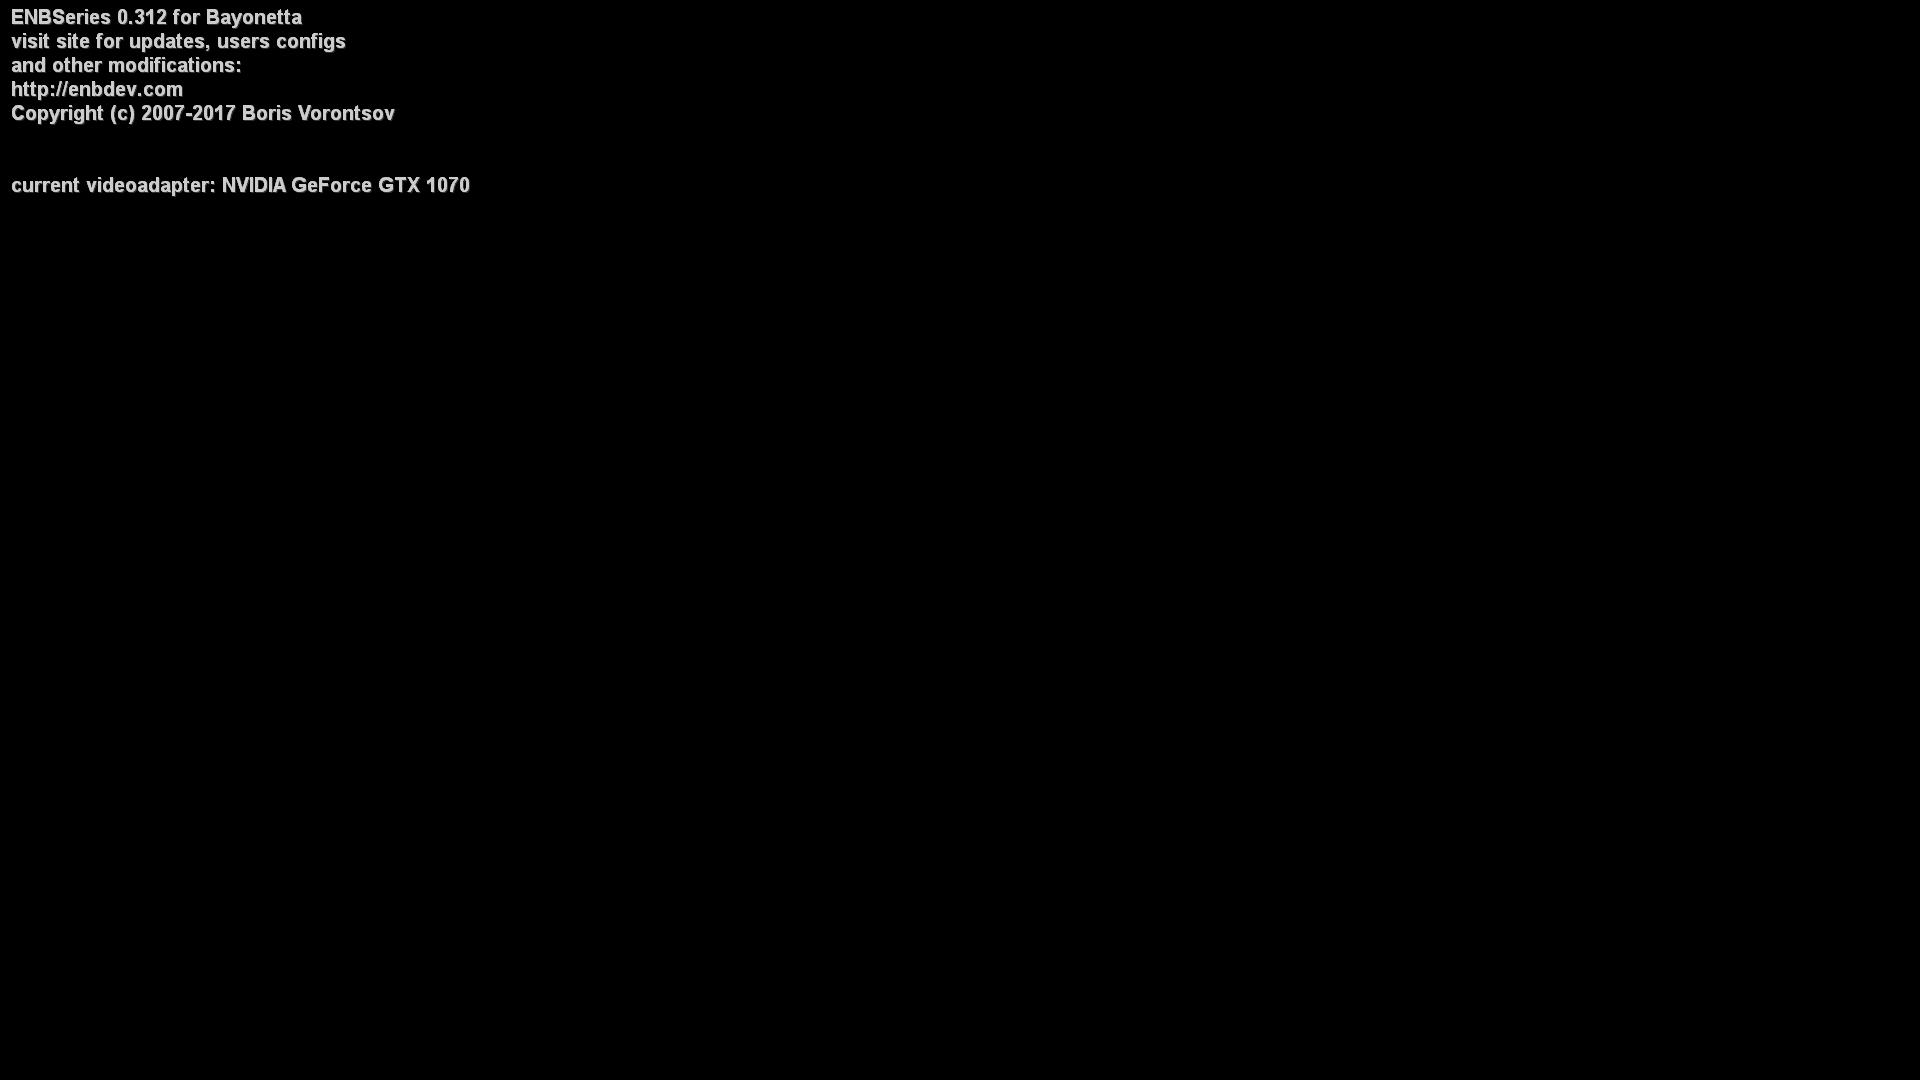 Steam Community :: Guide :: Bayonetta ENB (Colour Correction)